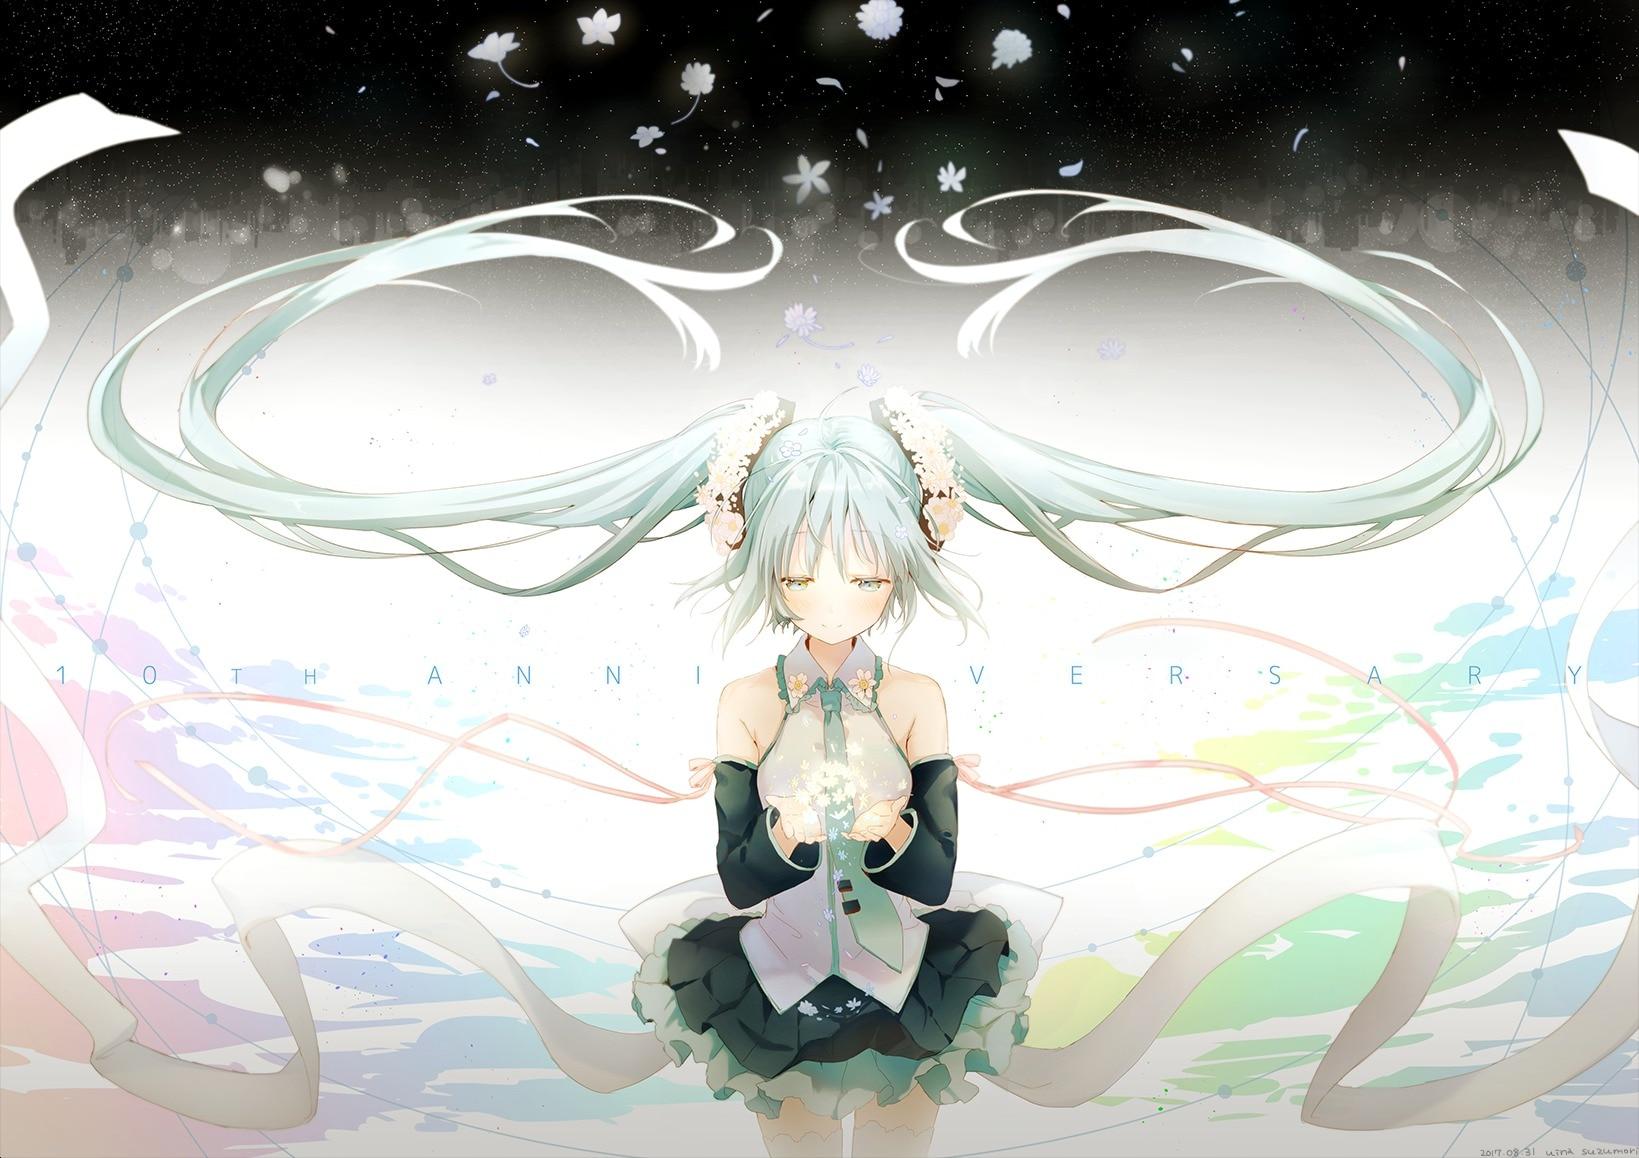 【P站画师】日本画师sakana的插画作品- ACG17.COM